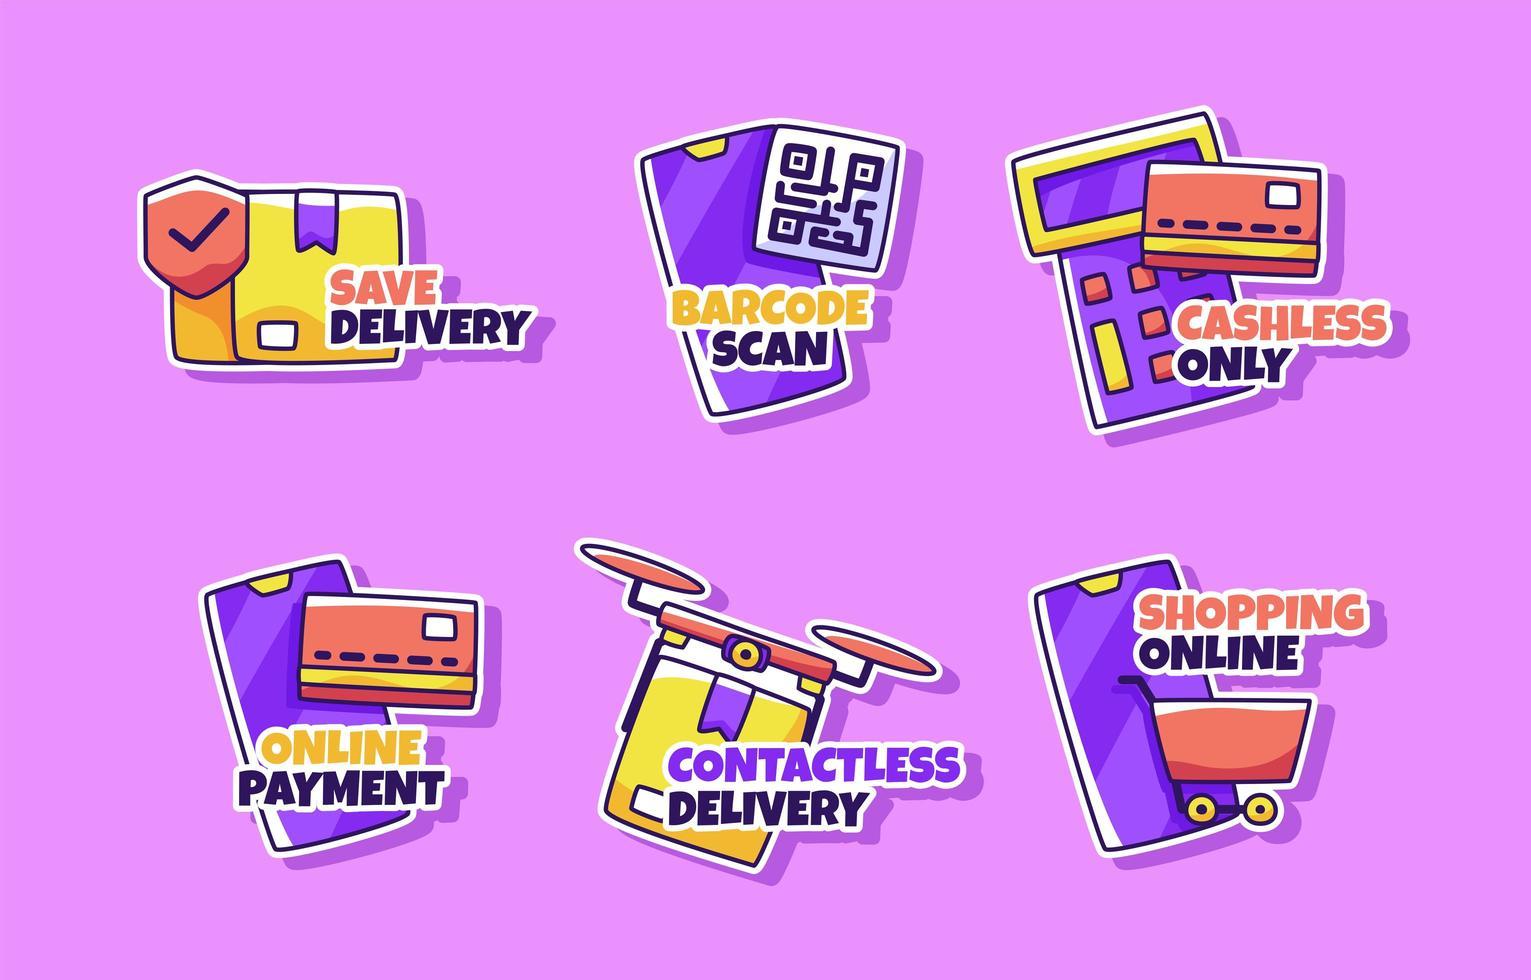 Online Shopping Contactless Technology vector